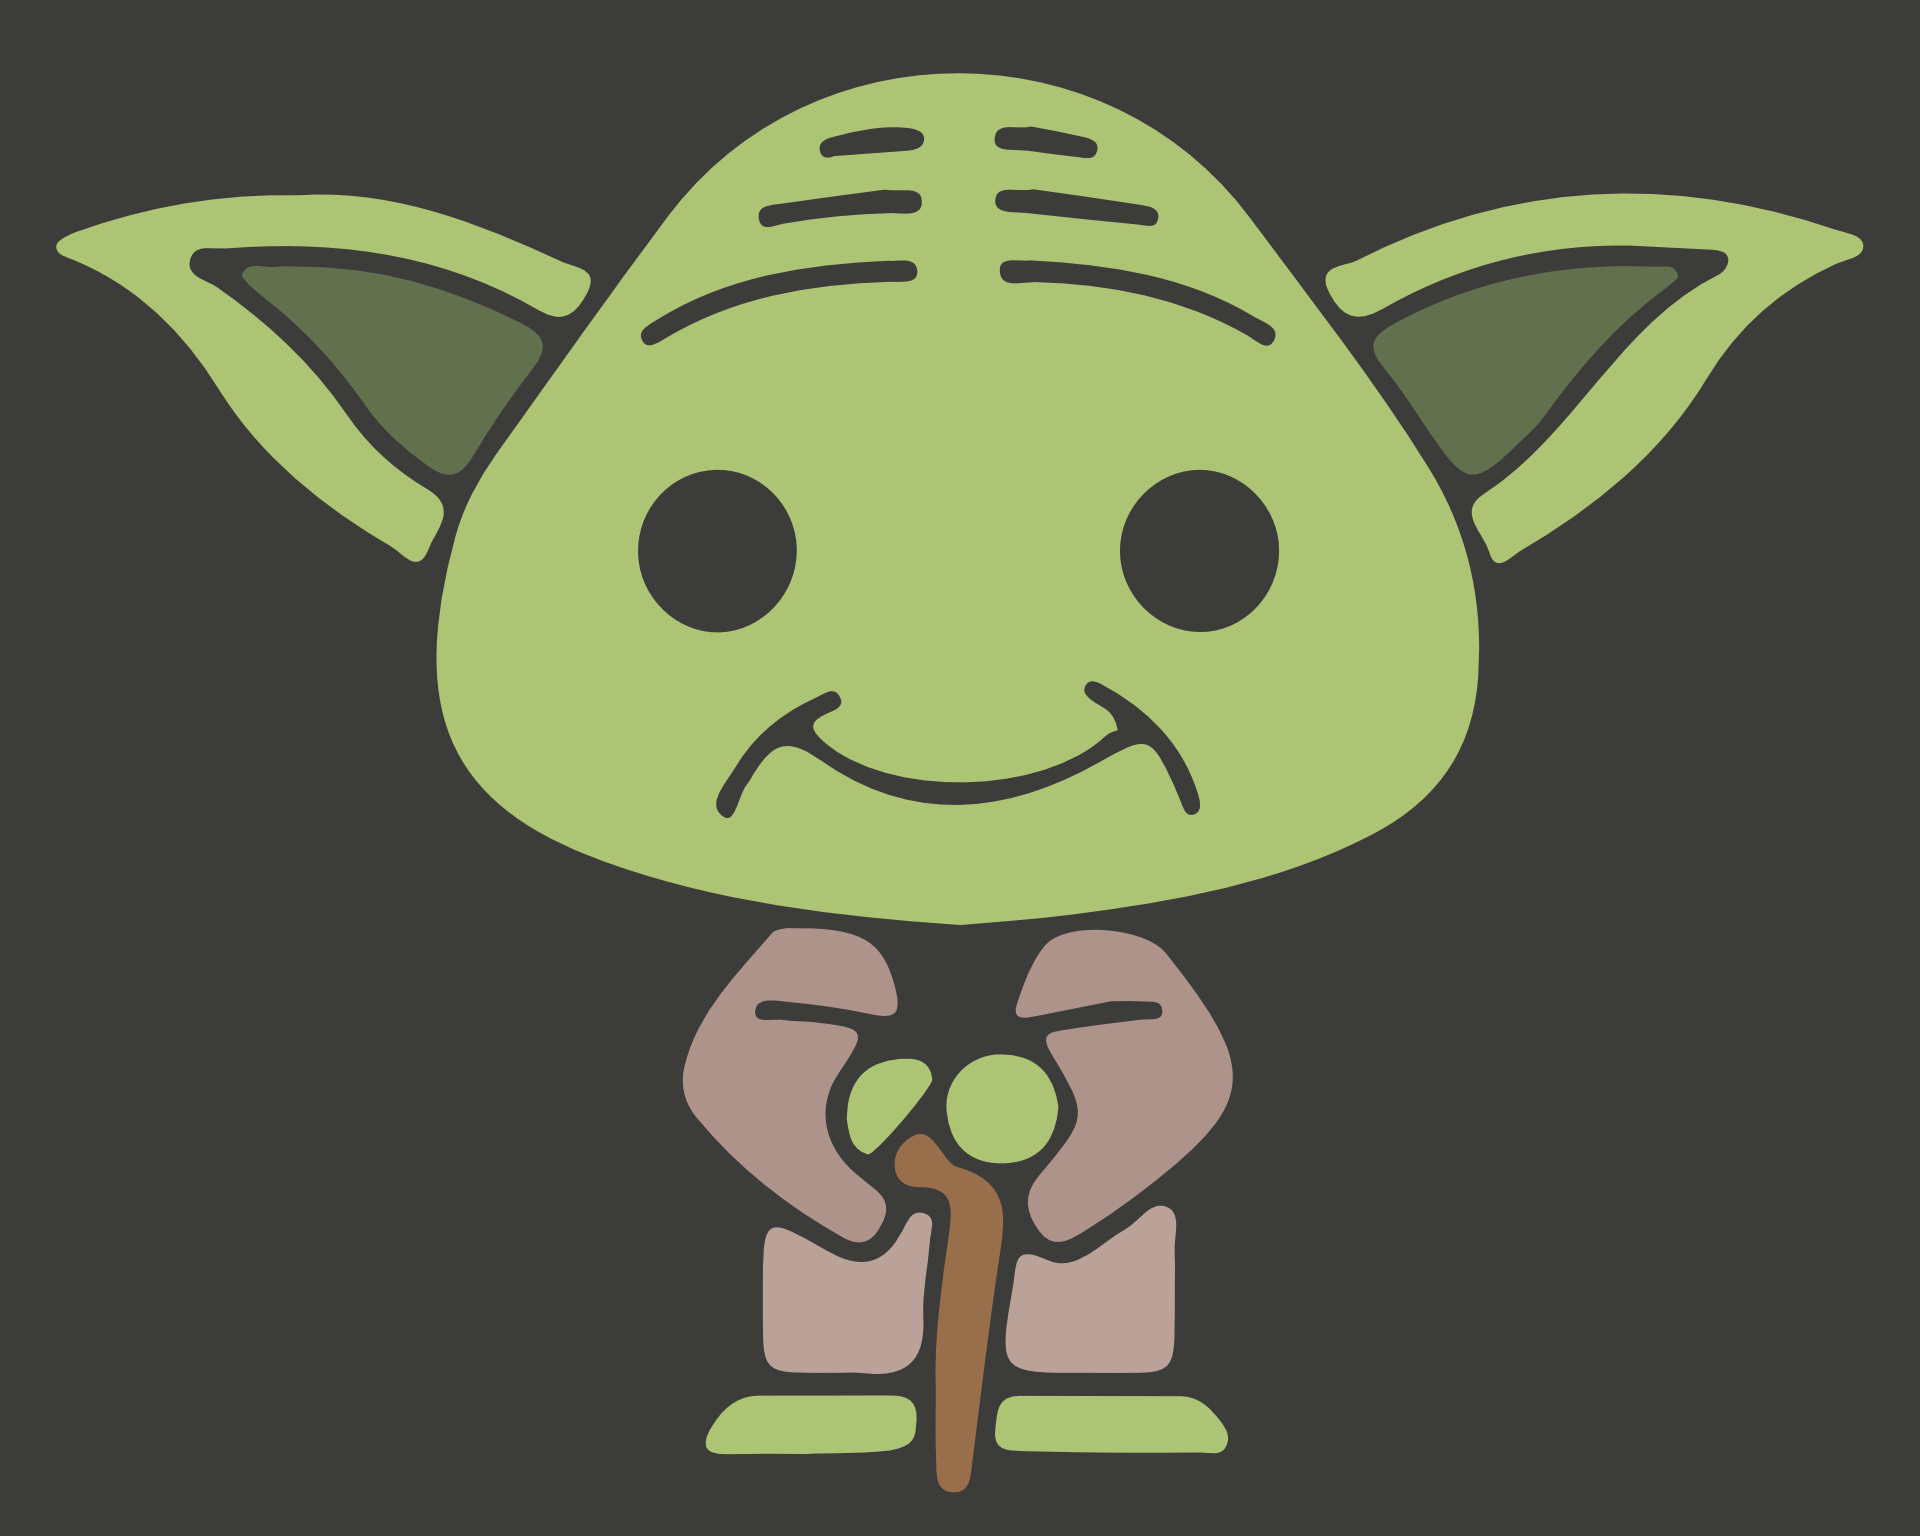 Yoda, जेडी, star wars, स्टार वार्स, बल - HD वॉलपेपर - प्रोफेसर-falken.com